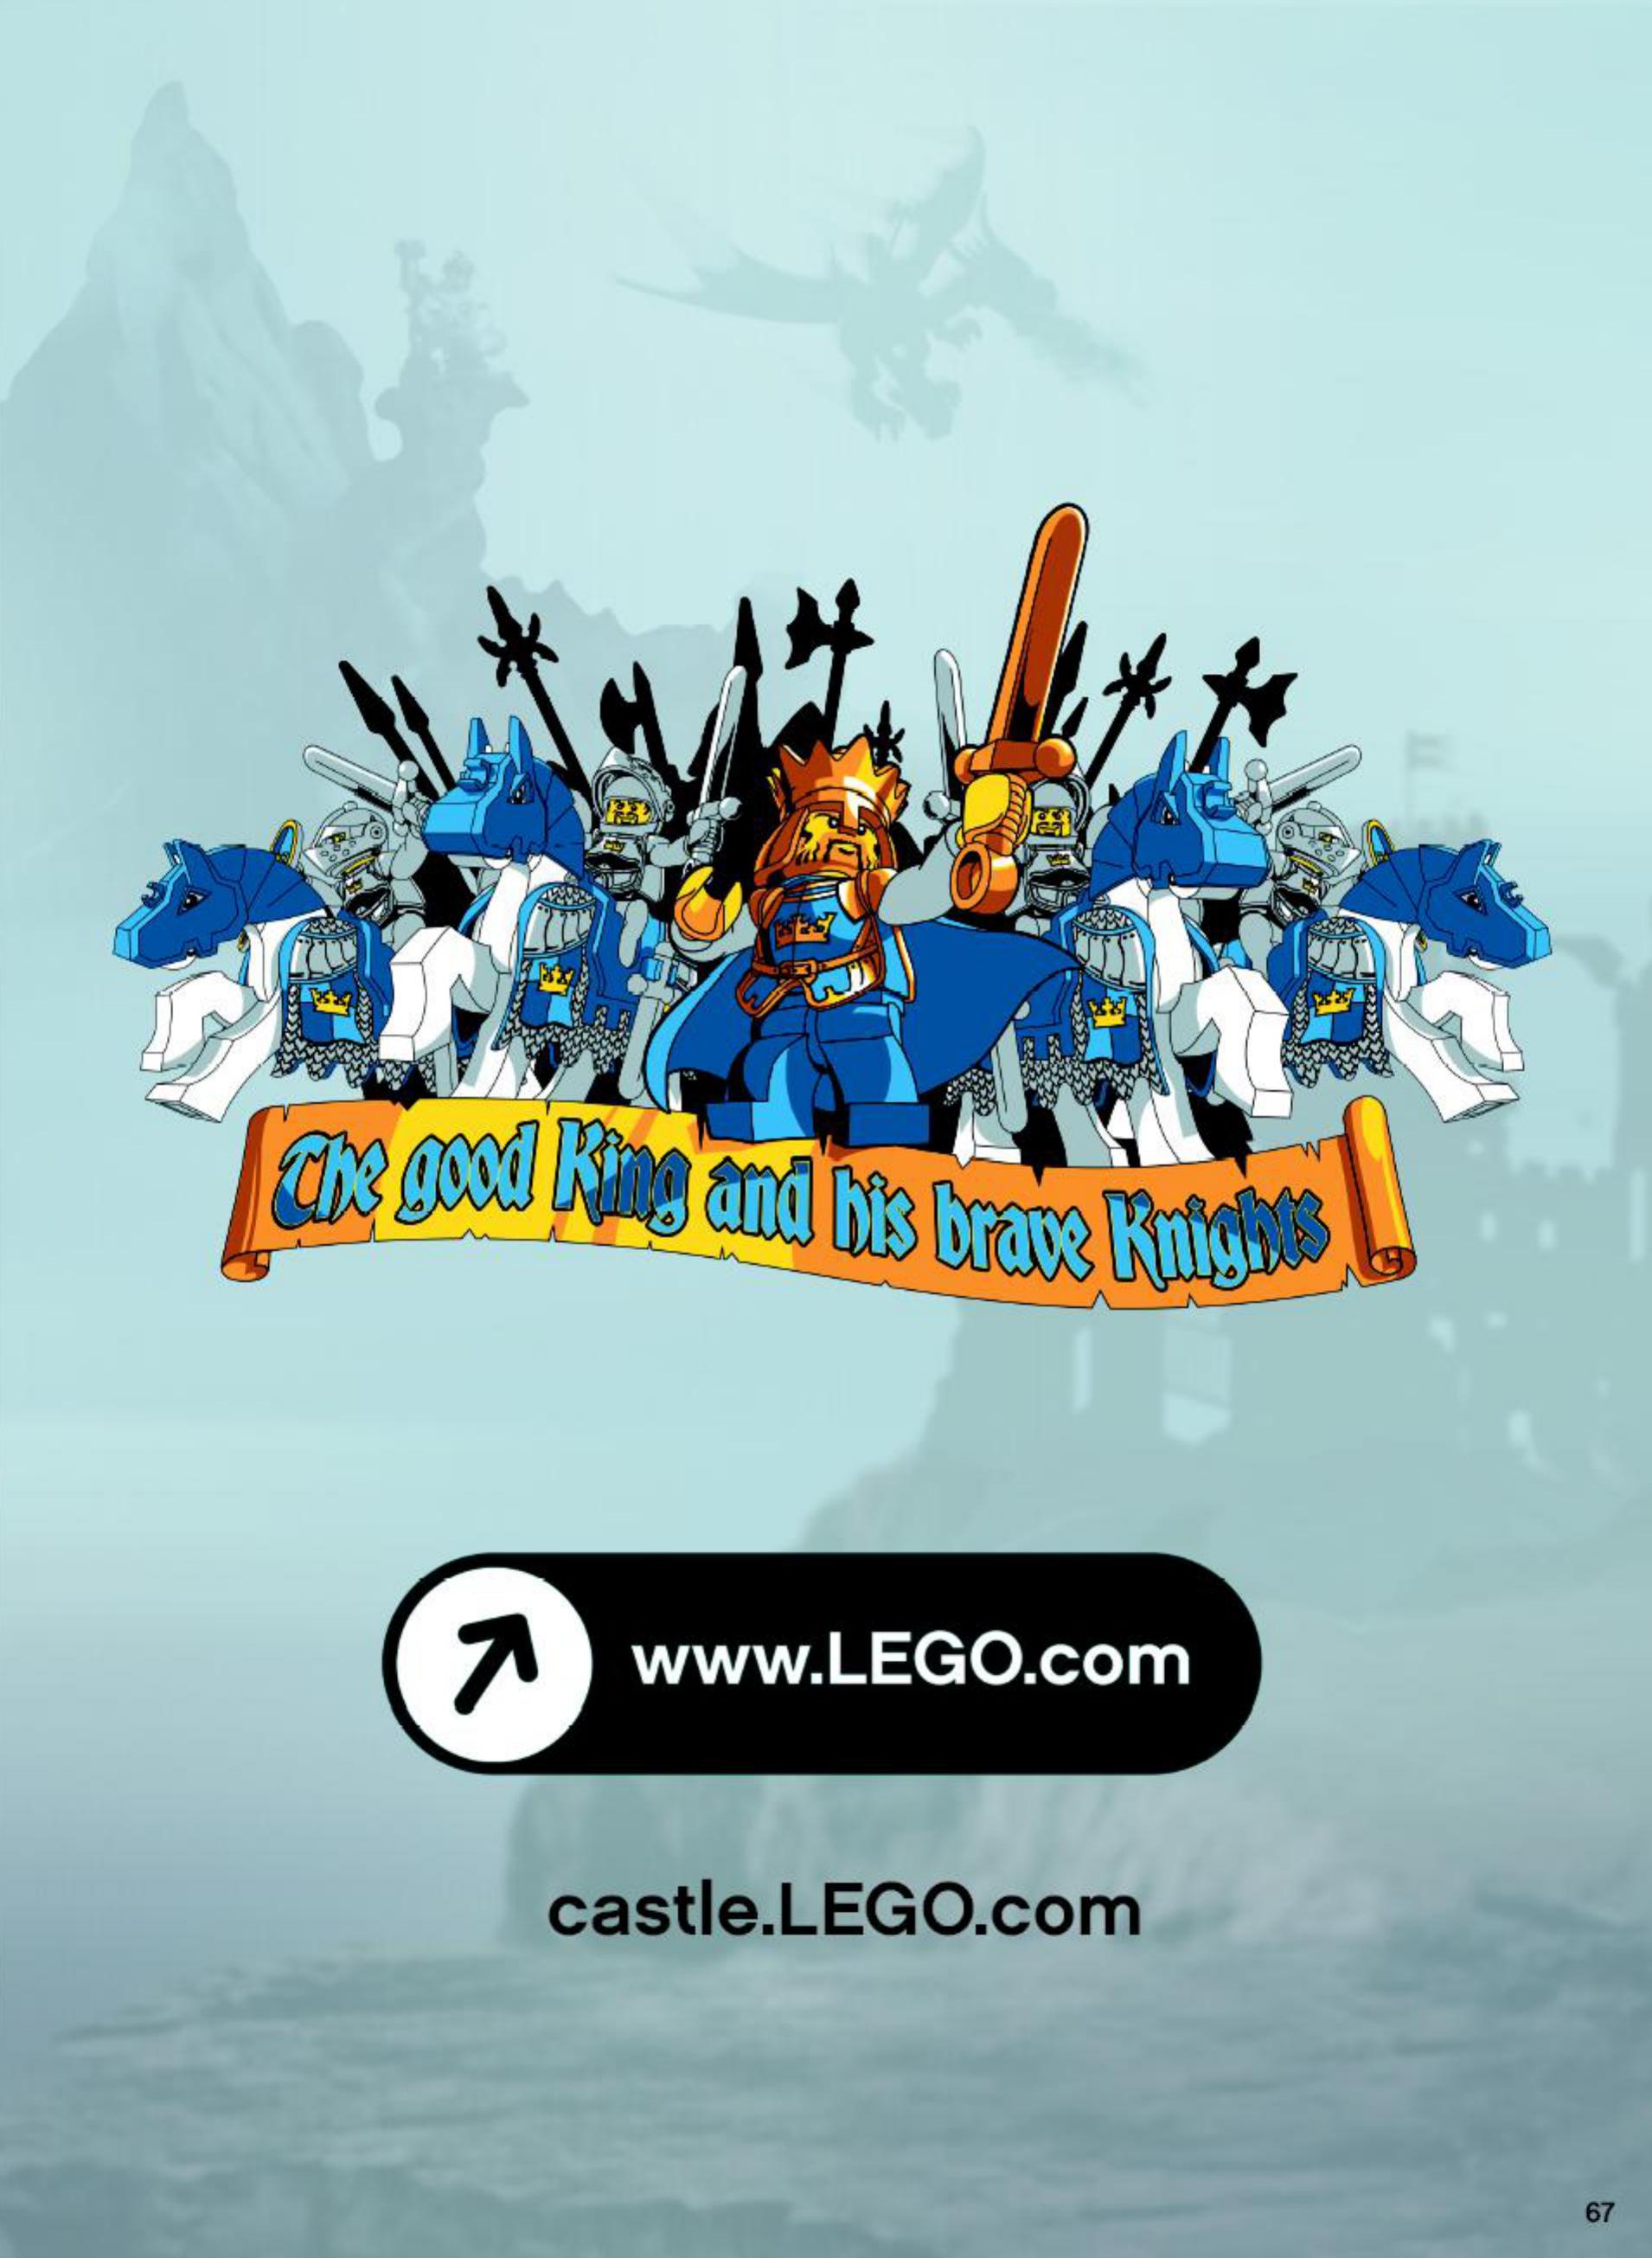 Handleiding Lego Castle Skeleton Tower 7093 Pagina 63 Van 76 Verder